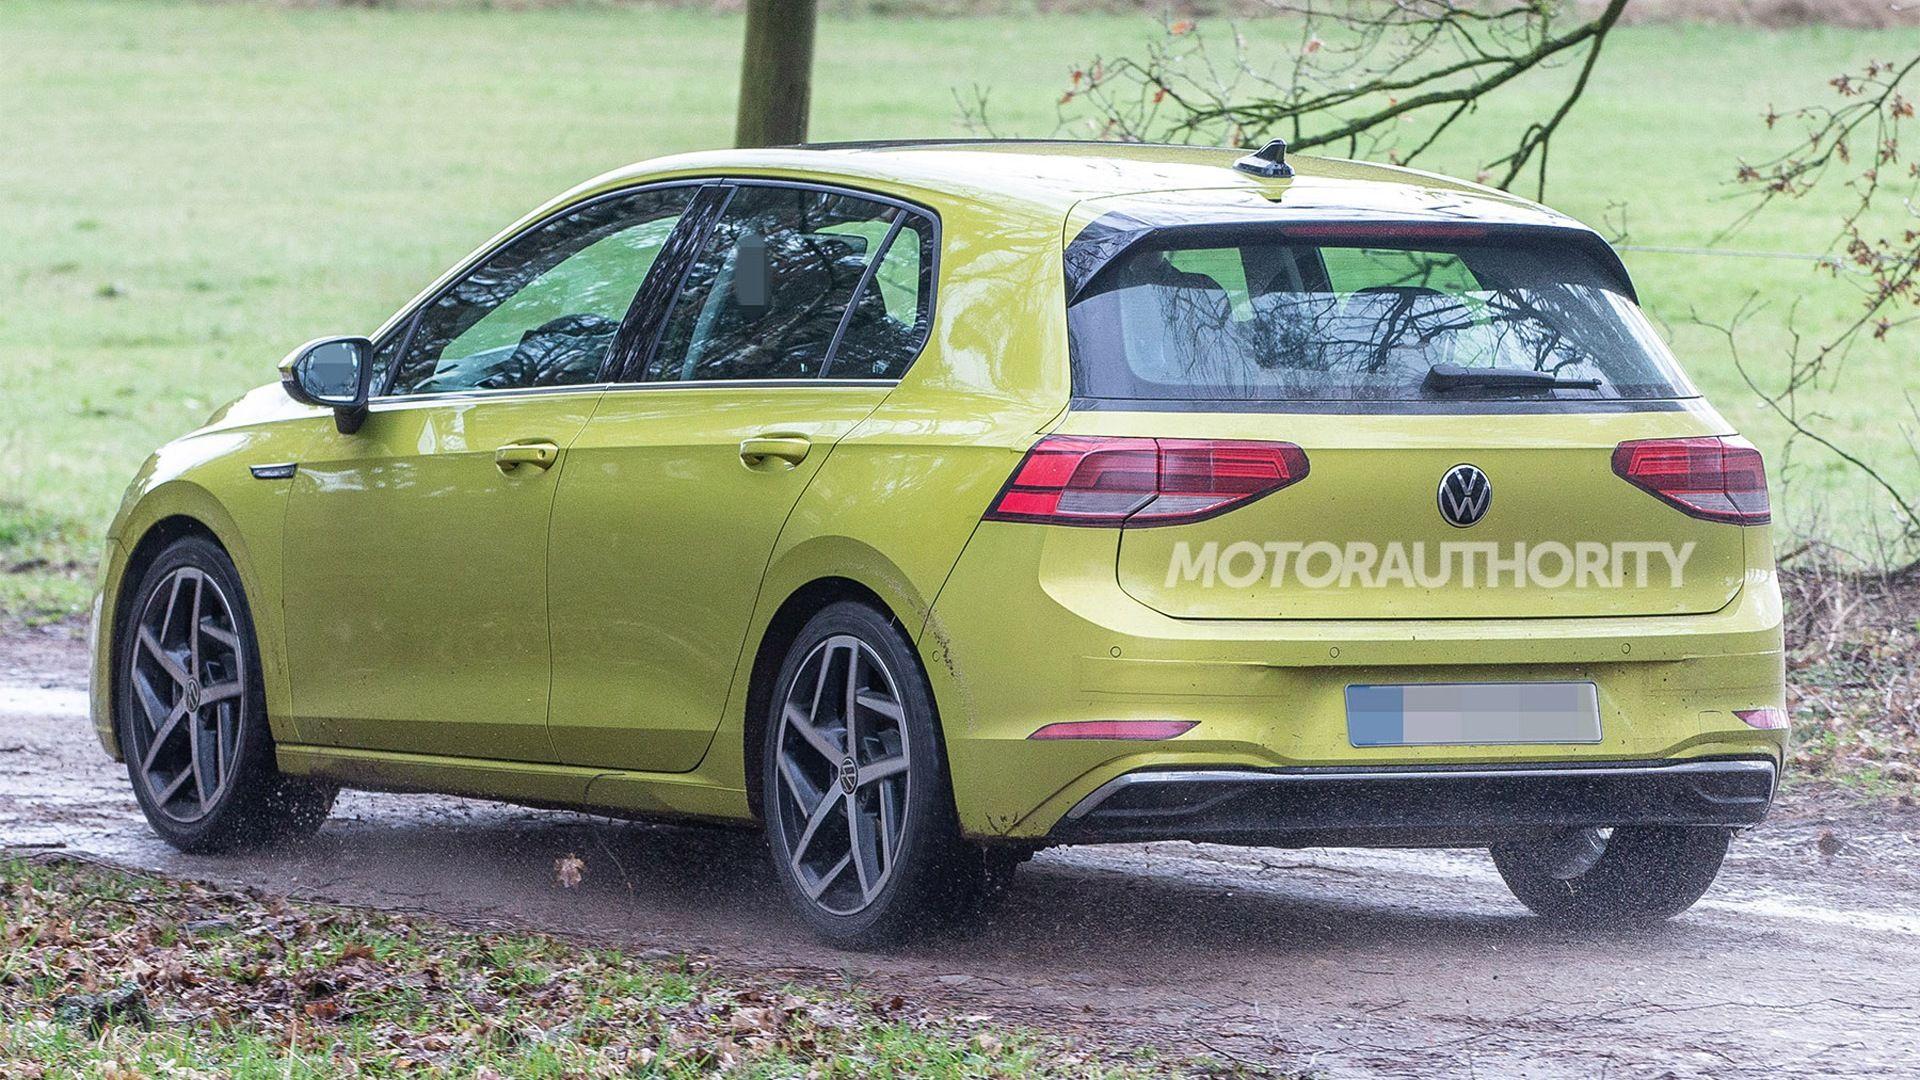 2020 Vw Golf R Usa Release Date And Price In 2020 Vw Golf Volkswagen Volkswagen Golf R